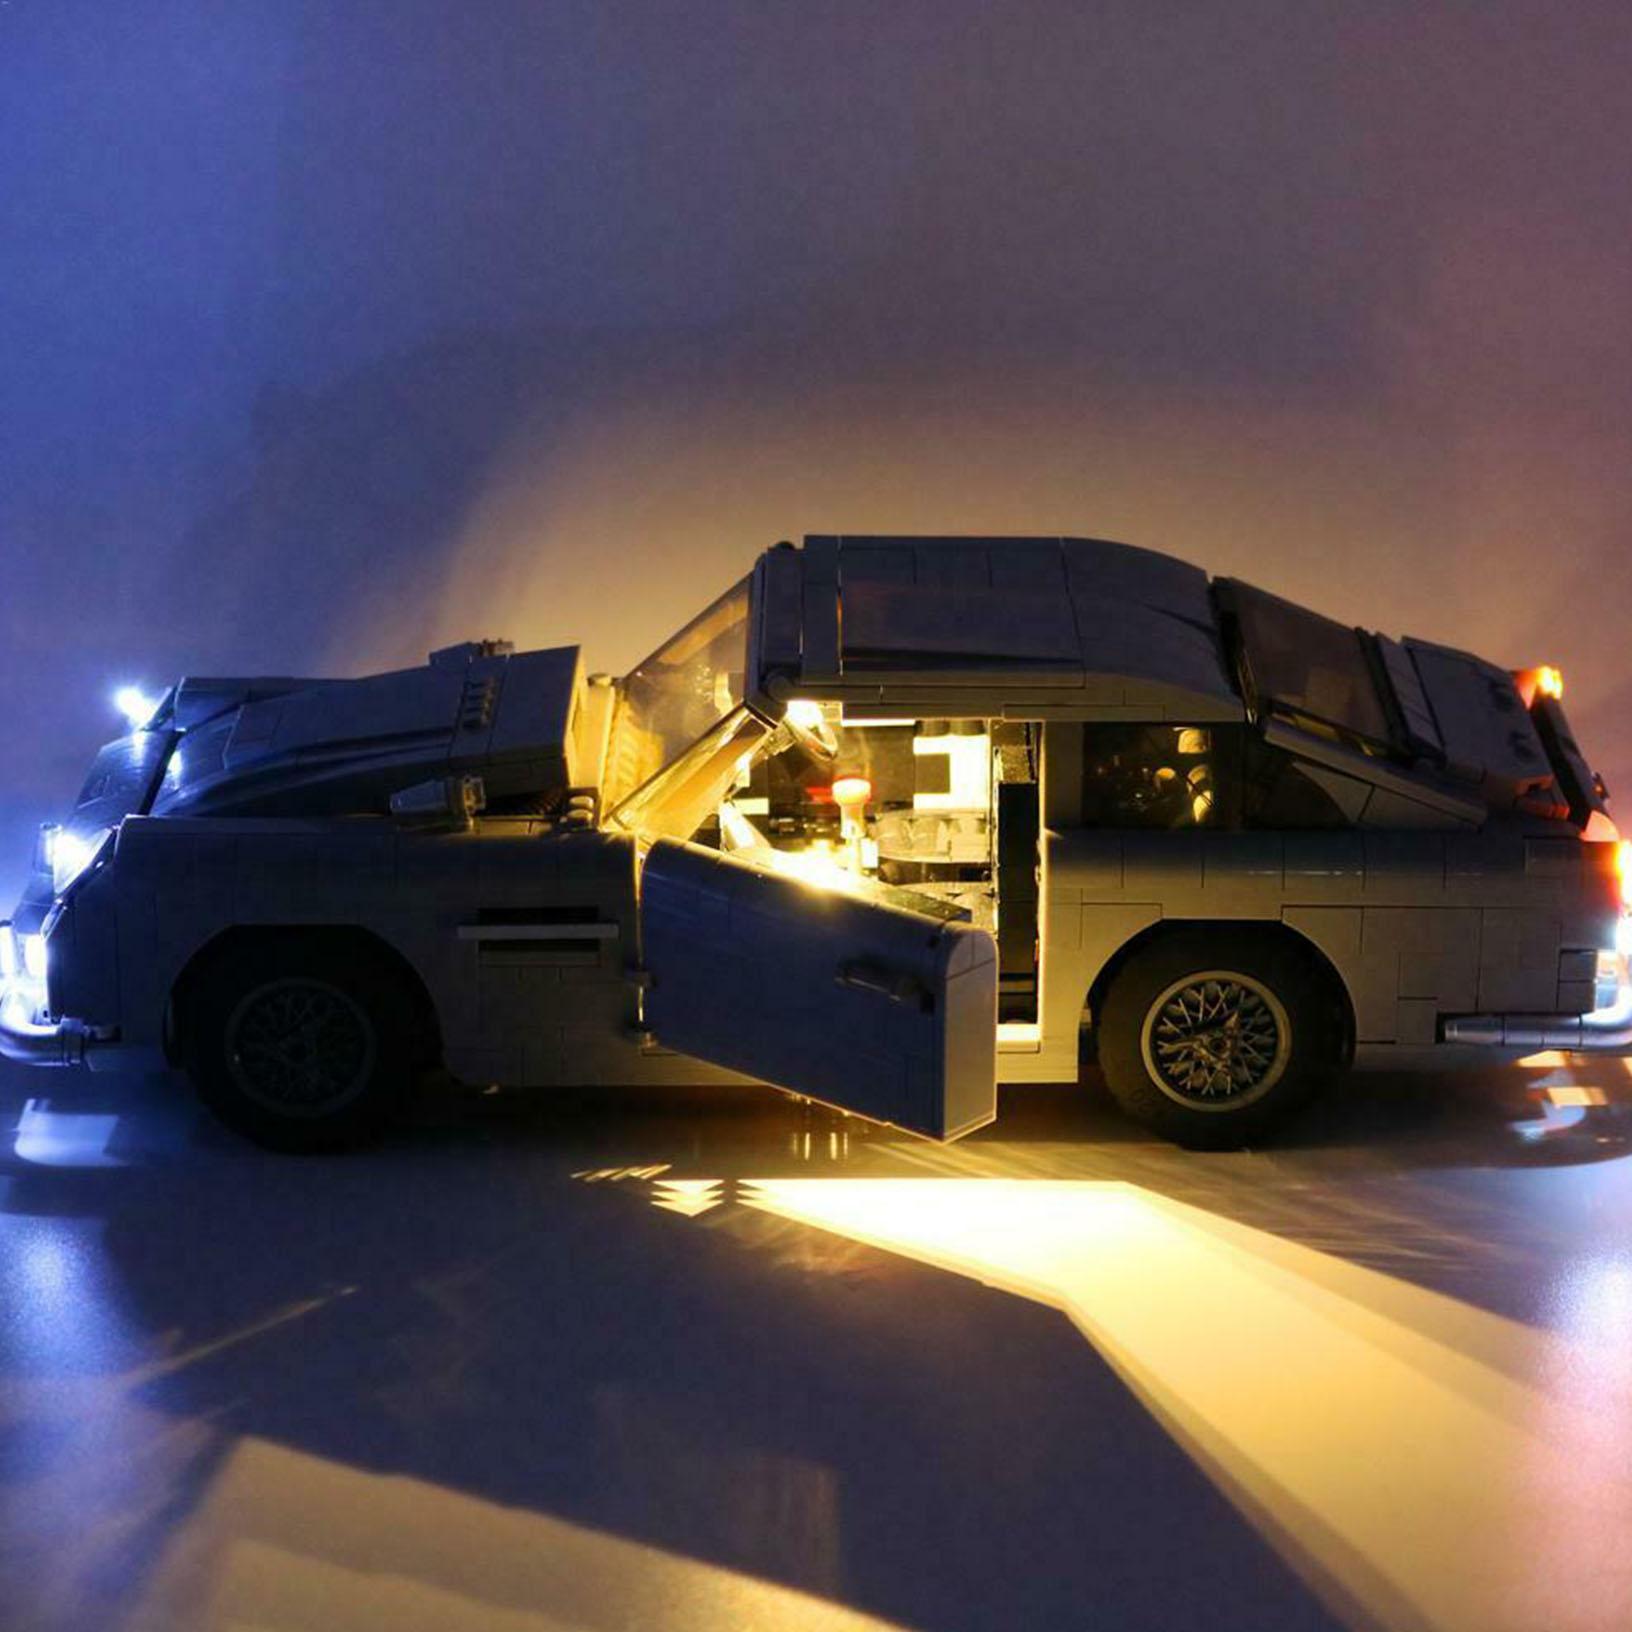 LED Light Kit For 10262 DB5 Creator James Bond lighting bricks A2H9